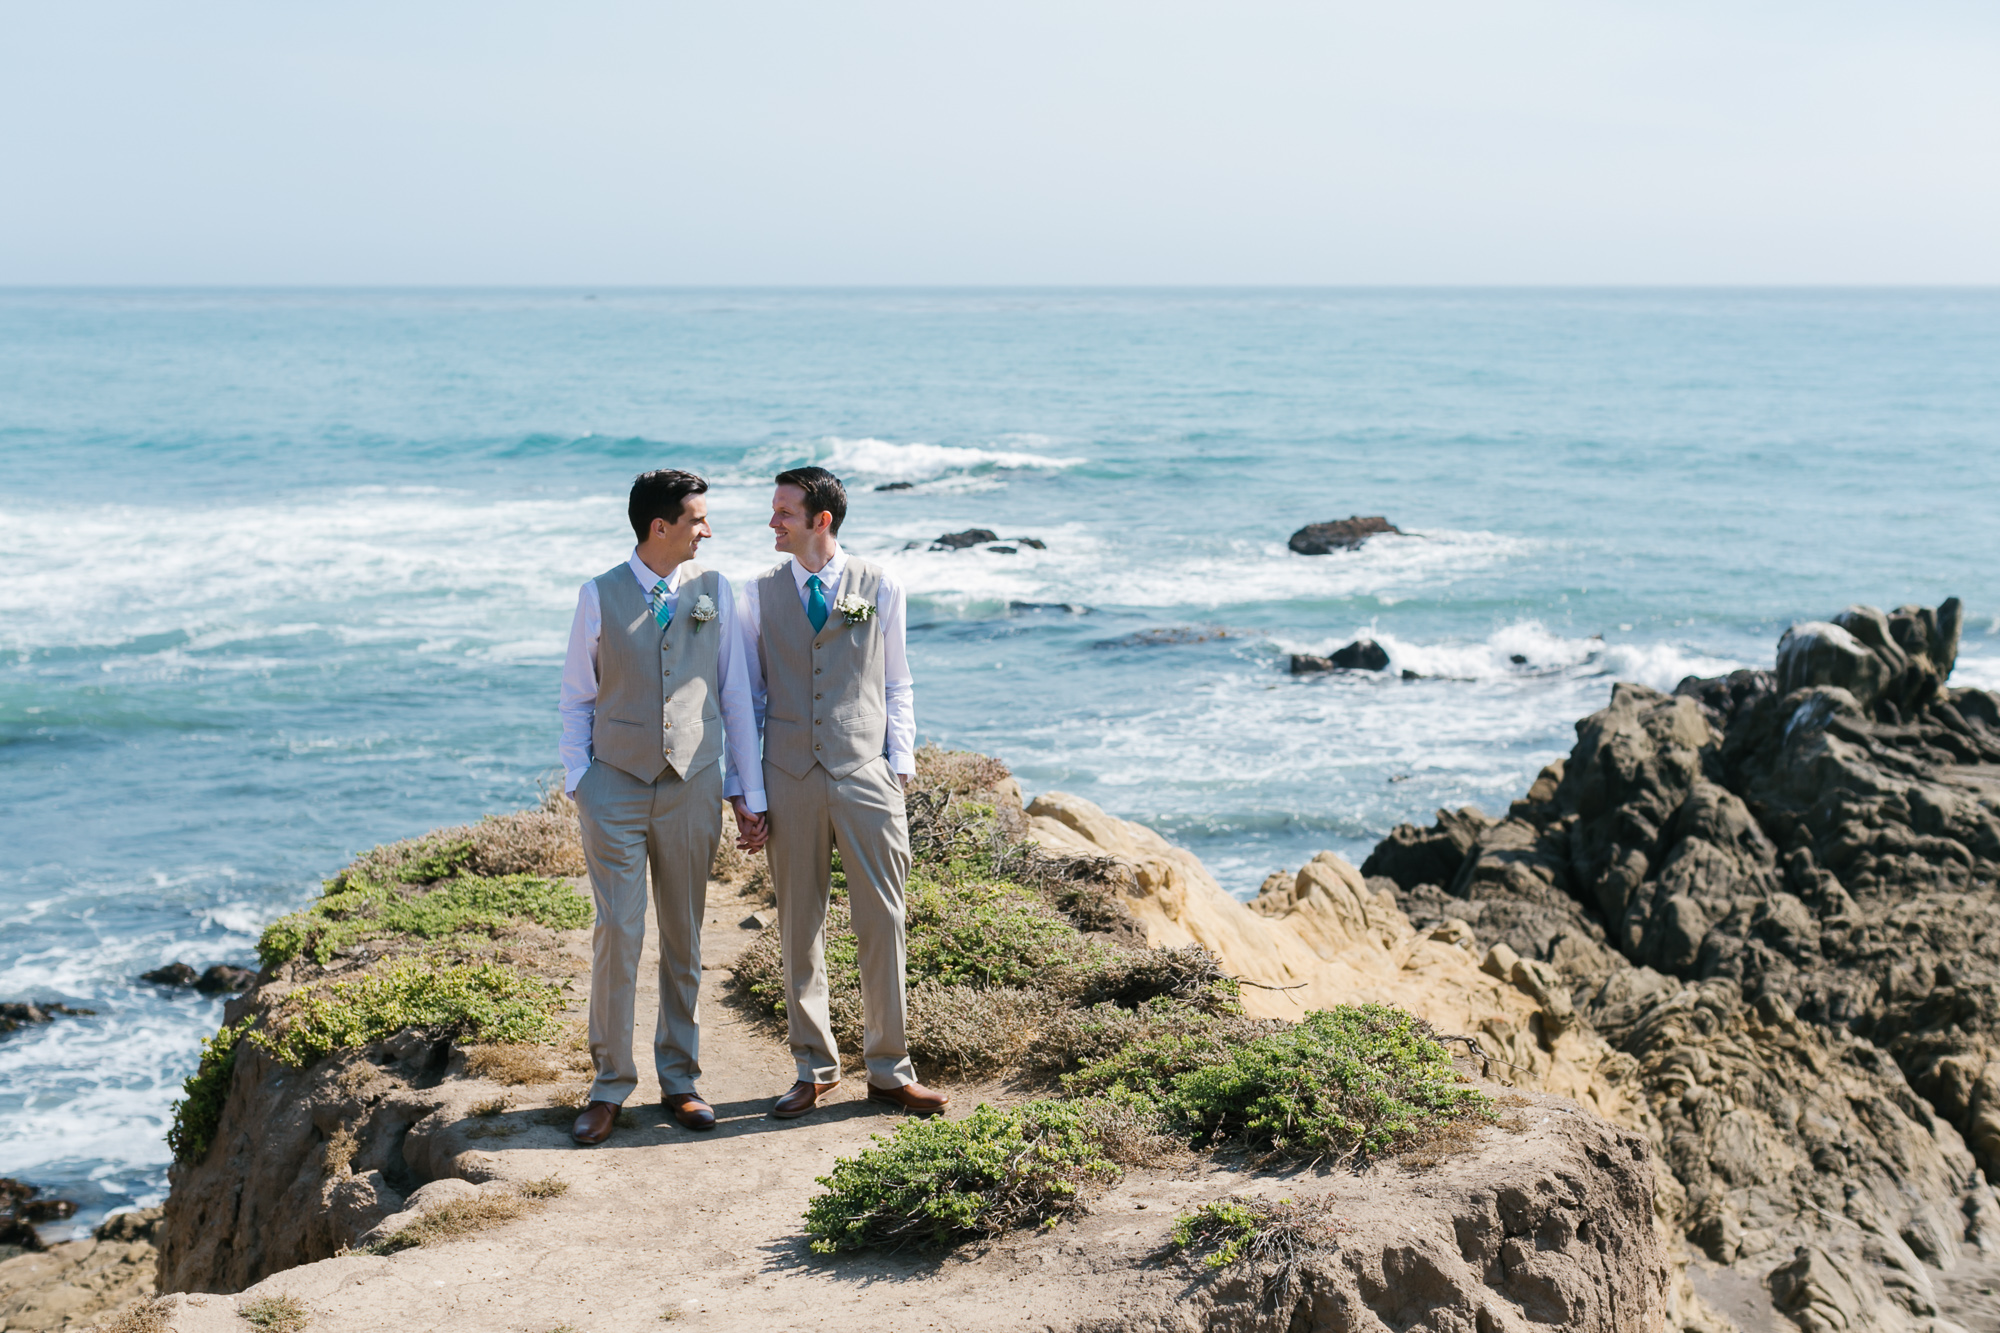 25_Cambria_wedding_samesex_coastal_intimate_Central_Coast_beach.jpg